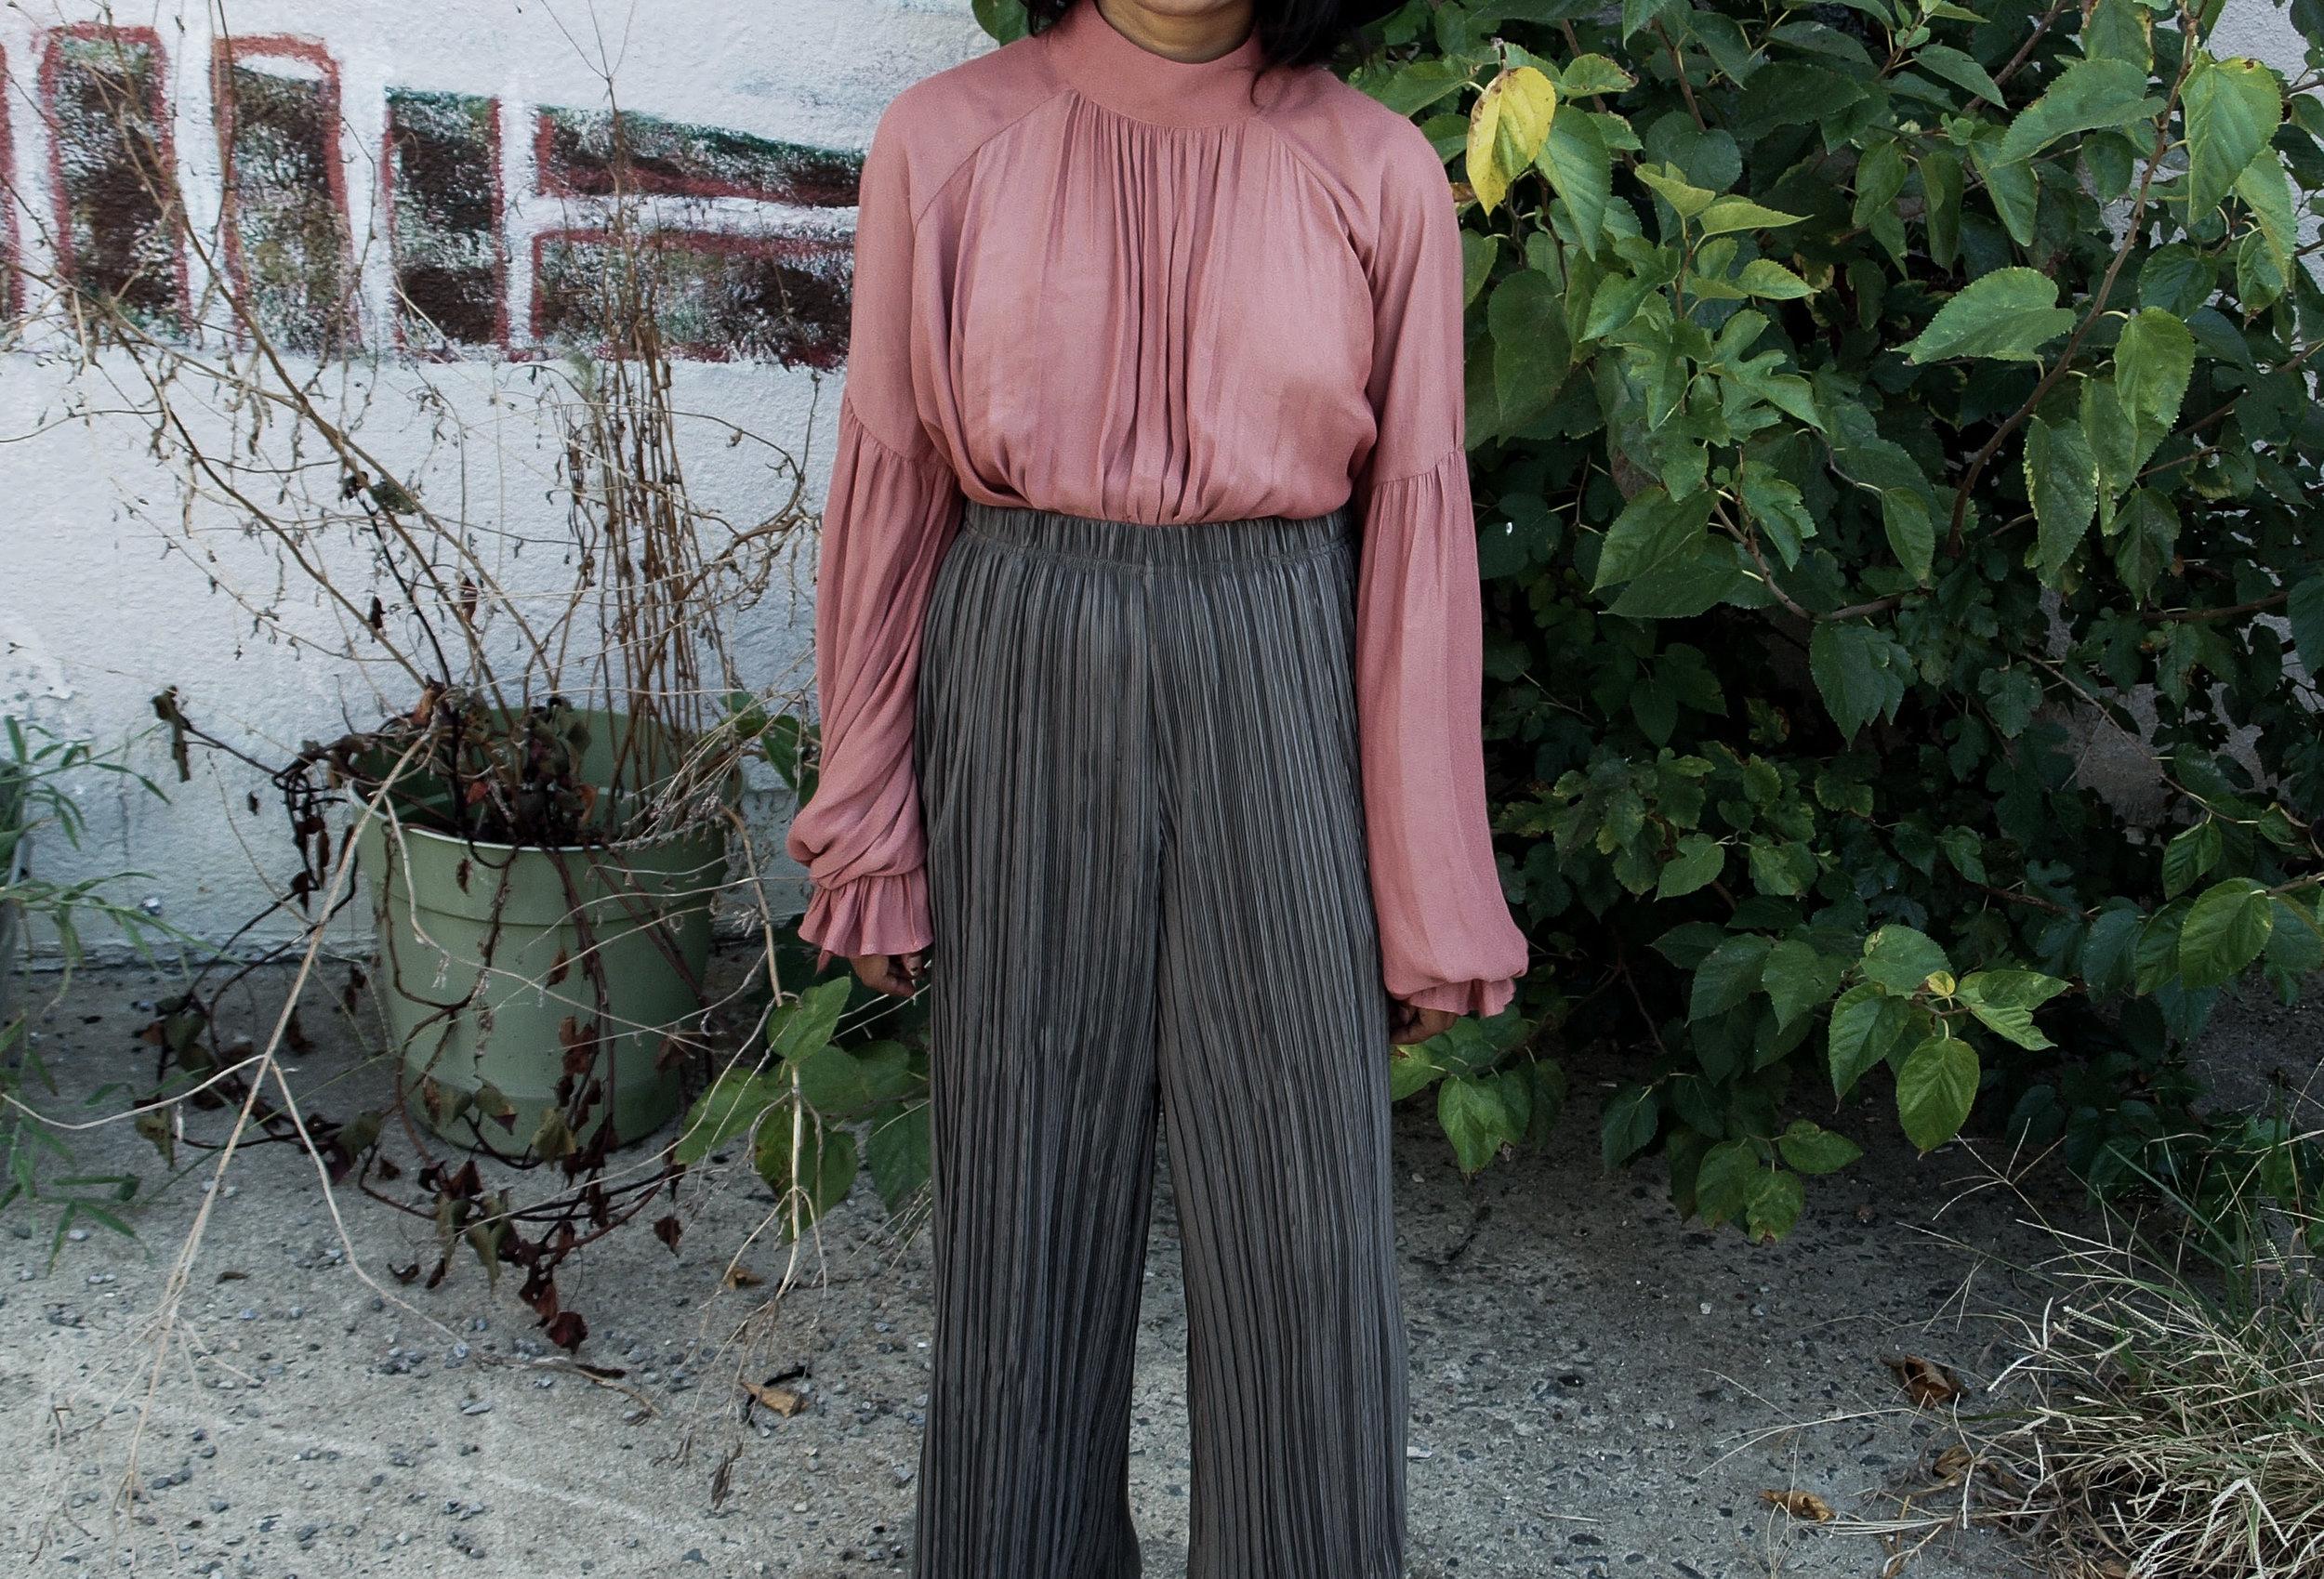 70s style fall fashion